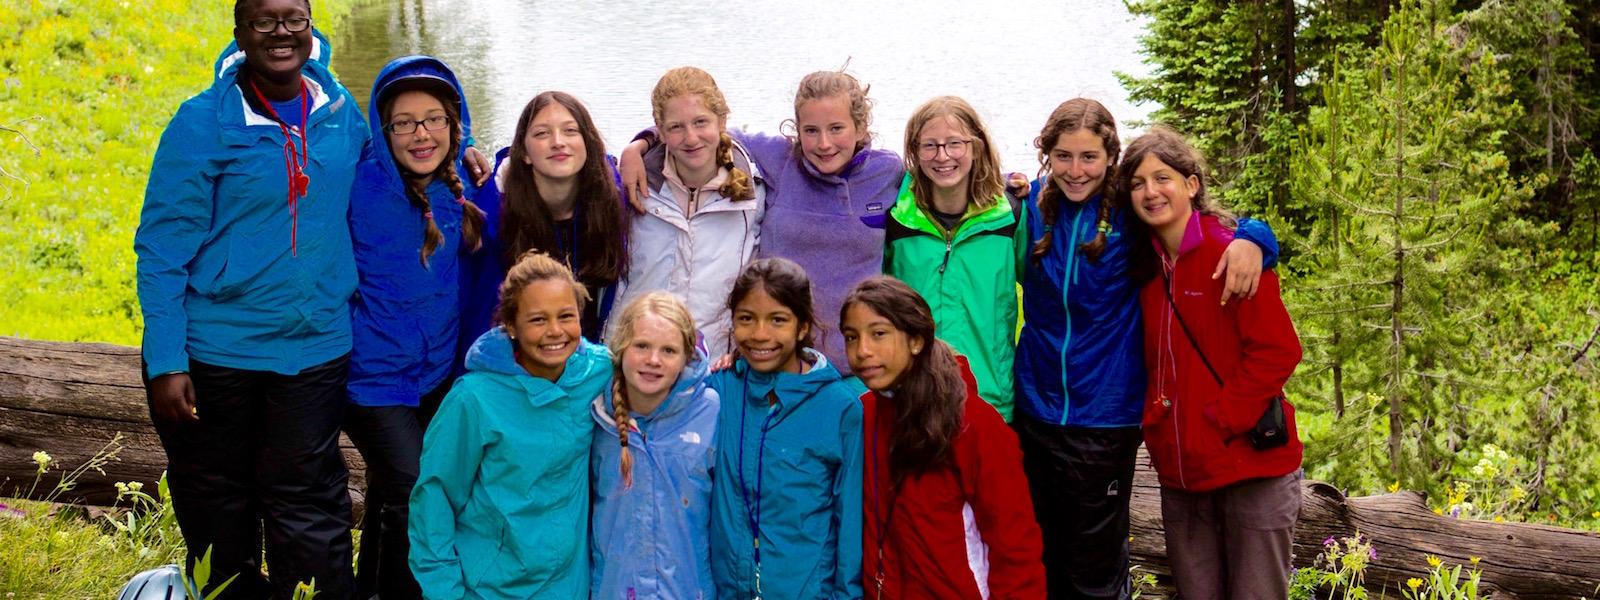 Teen Adventure Camp Group Behavior